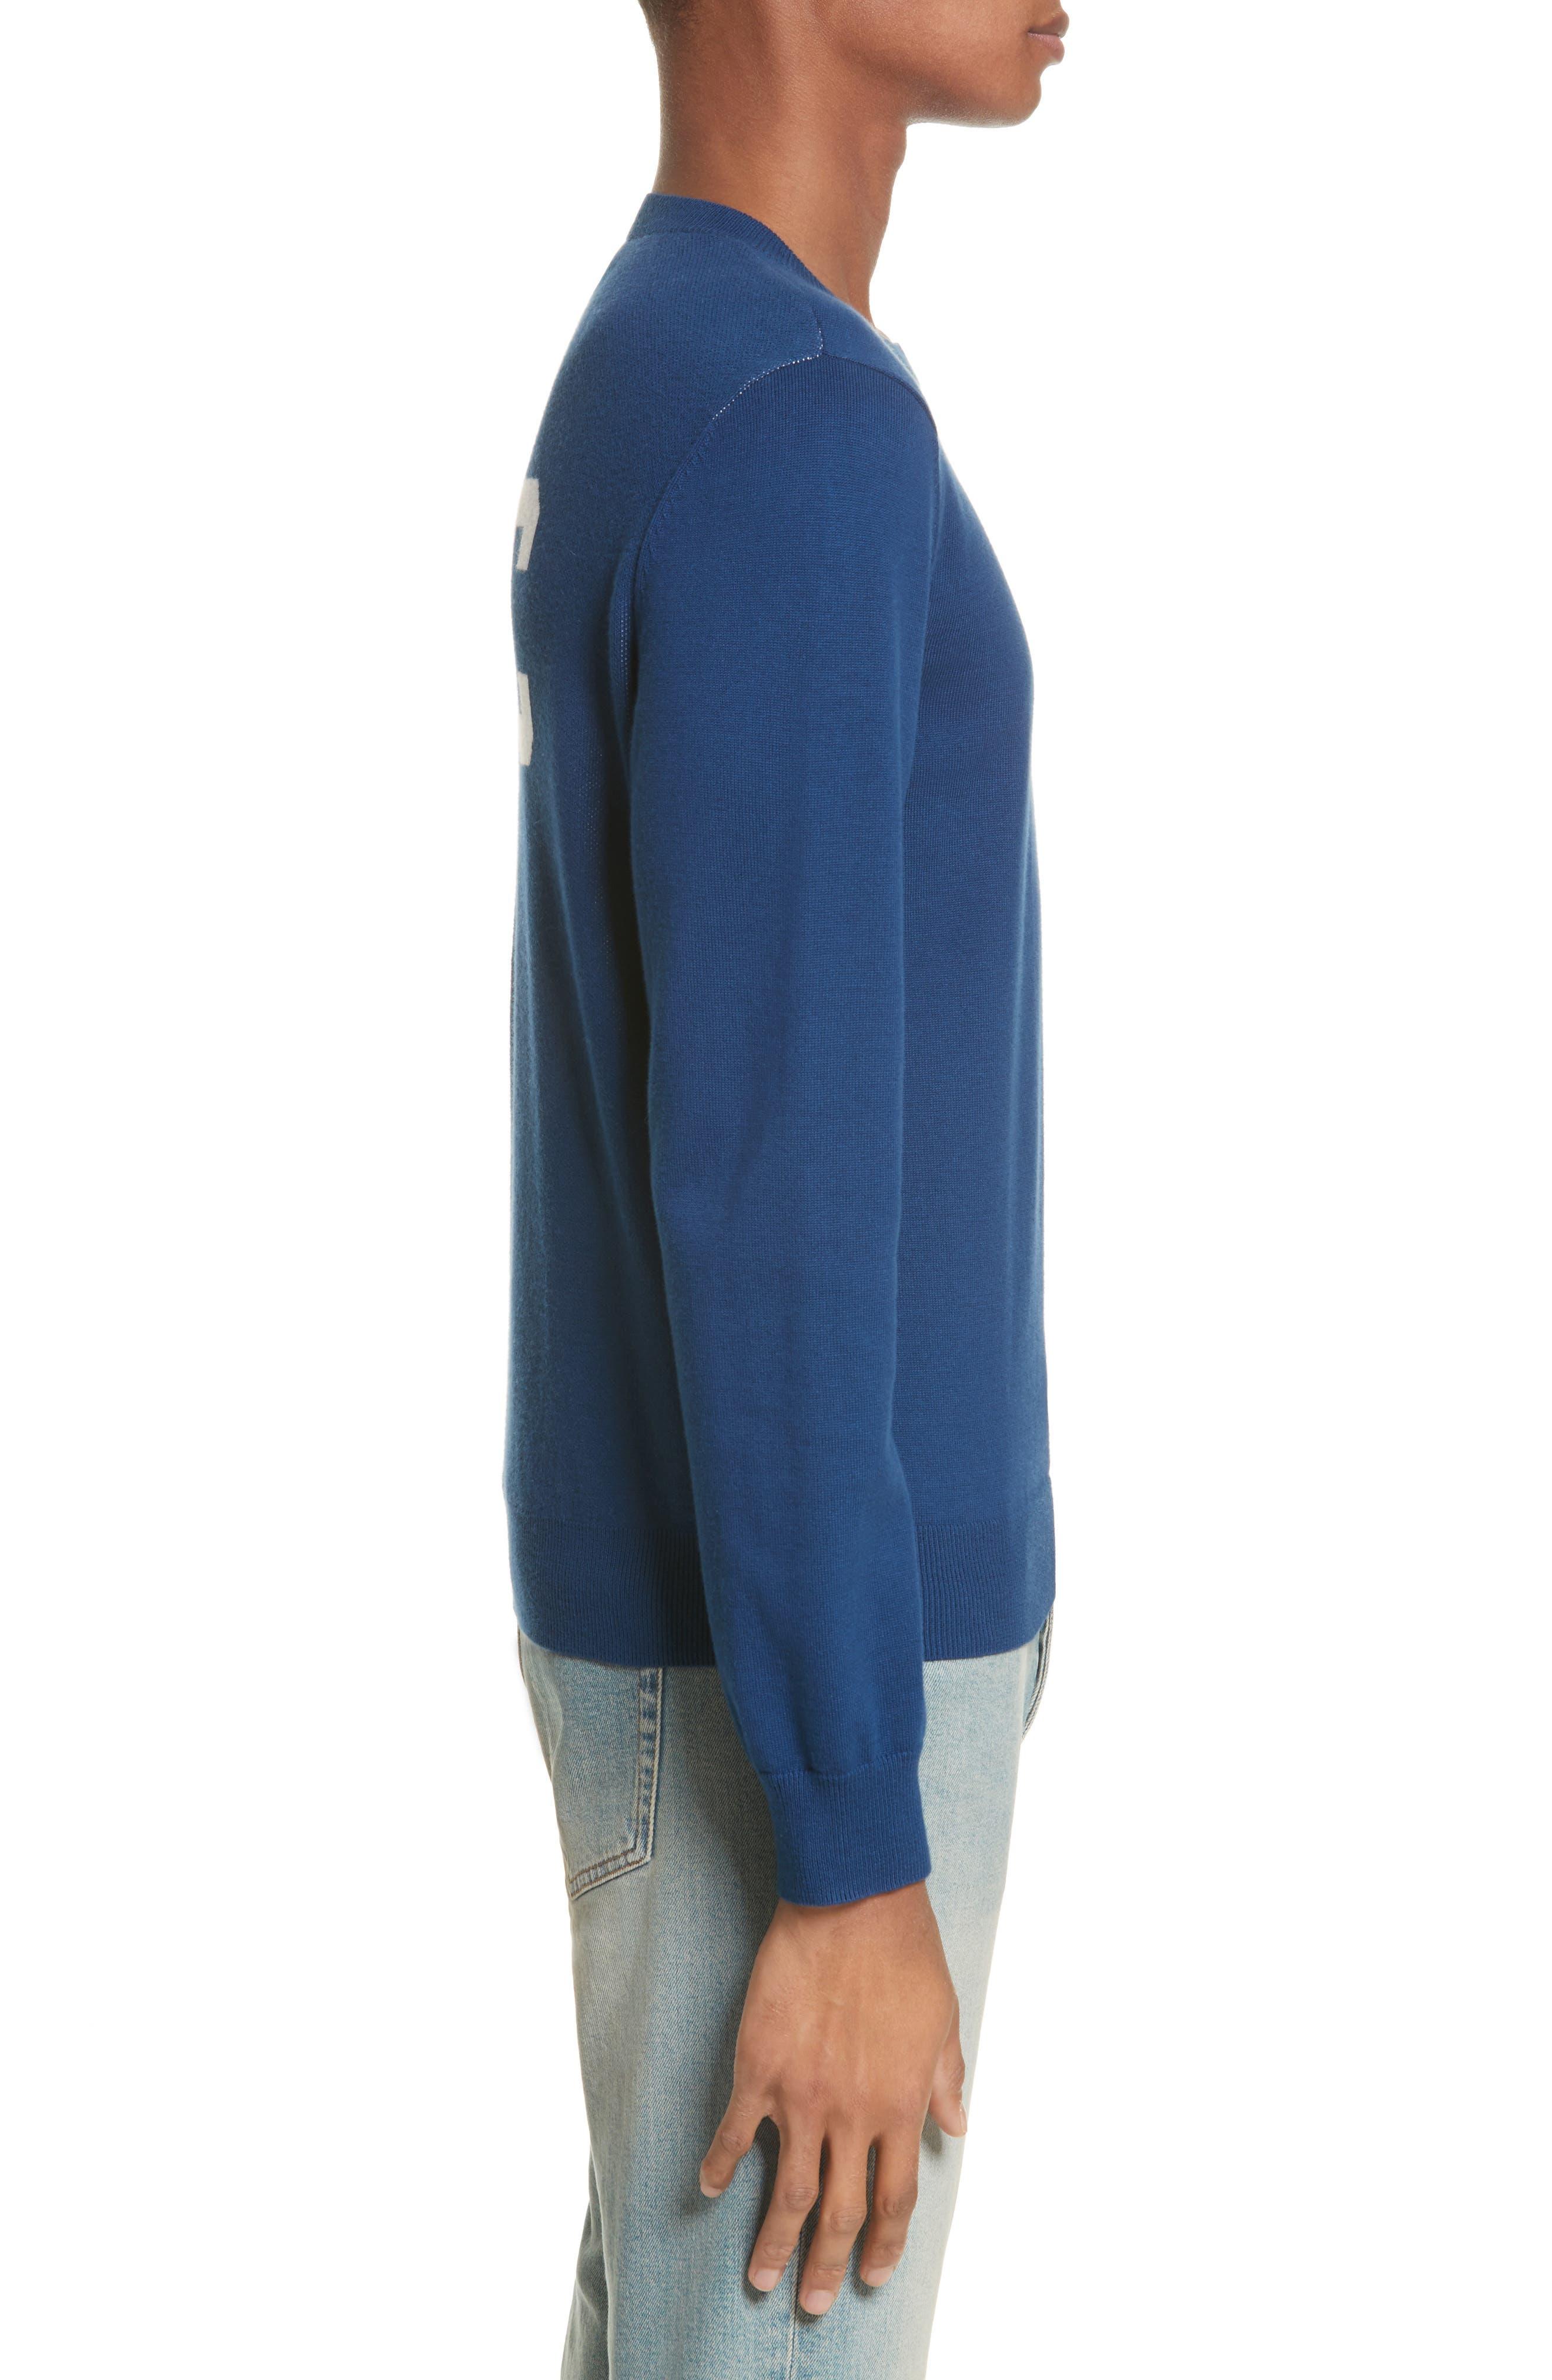 CIA Crewneck Sweater,                             Alternate thumbnail 3, color,                             Bleu Fonce Iah